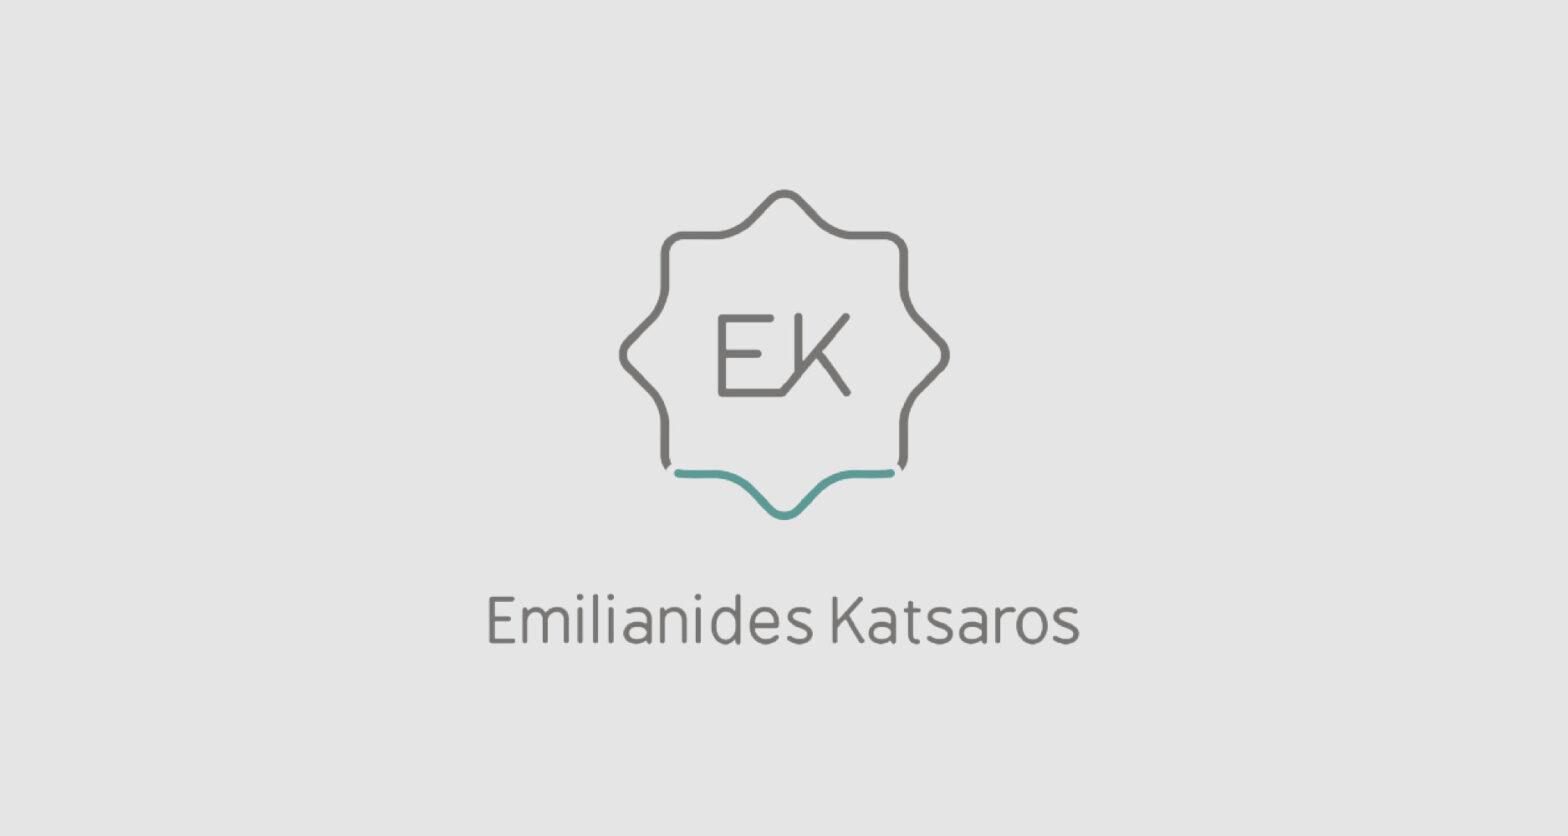 Emilianides Katsaros LLC joins the Commonwealth Legal Network